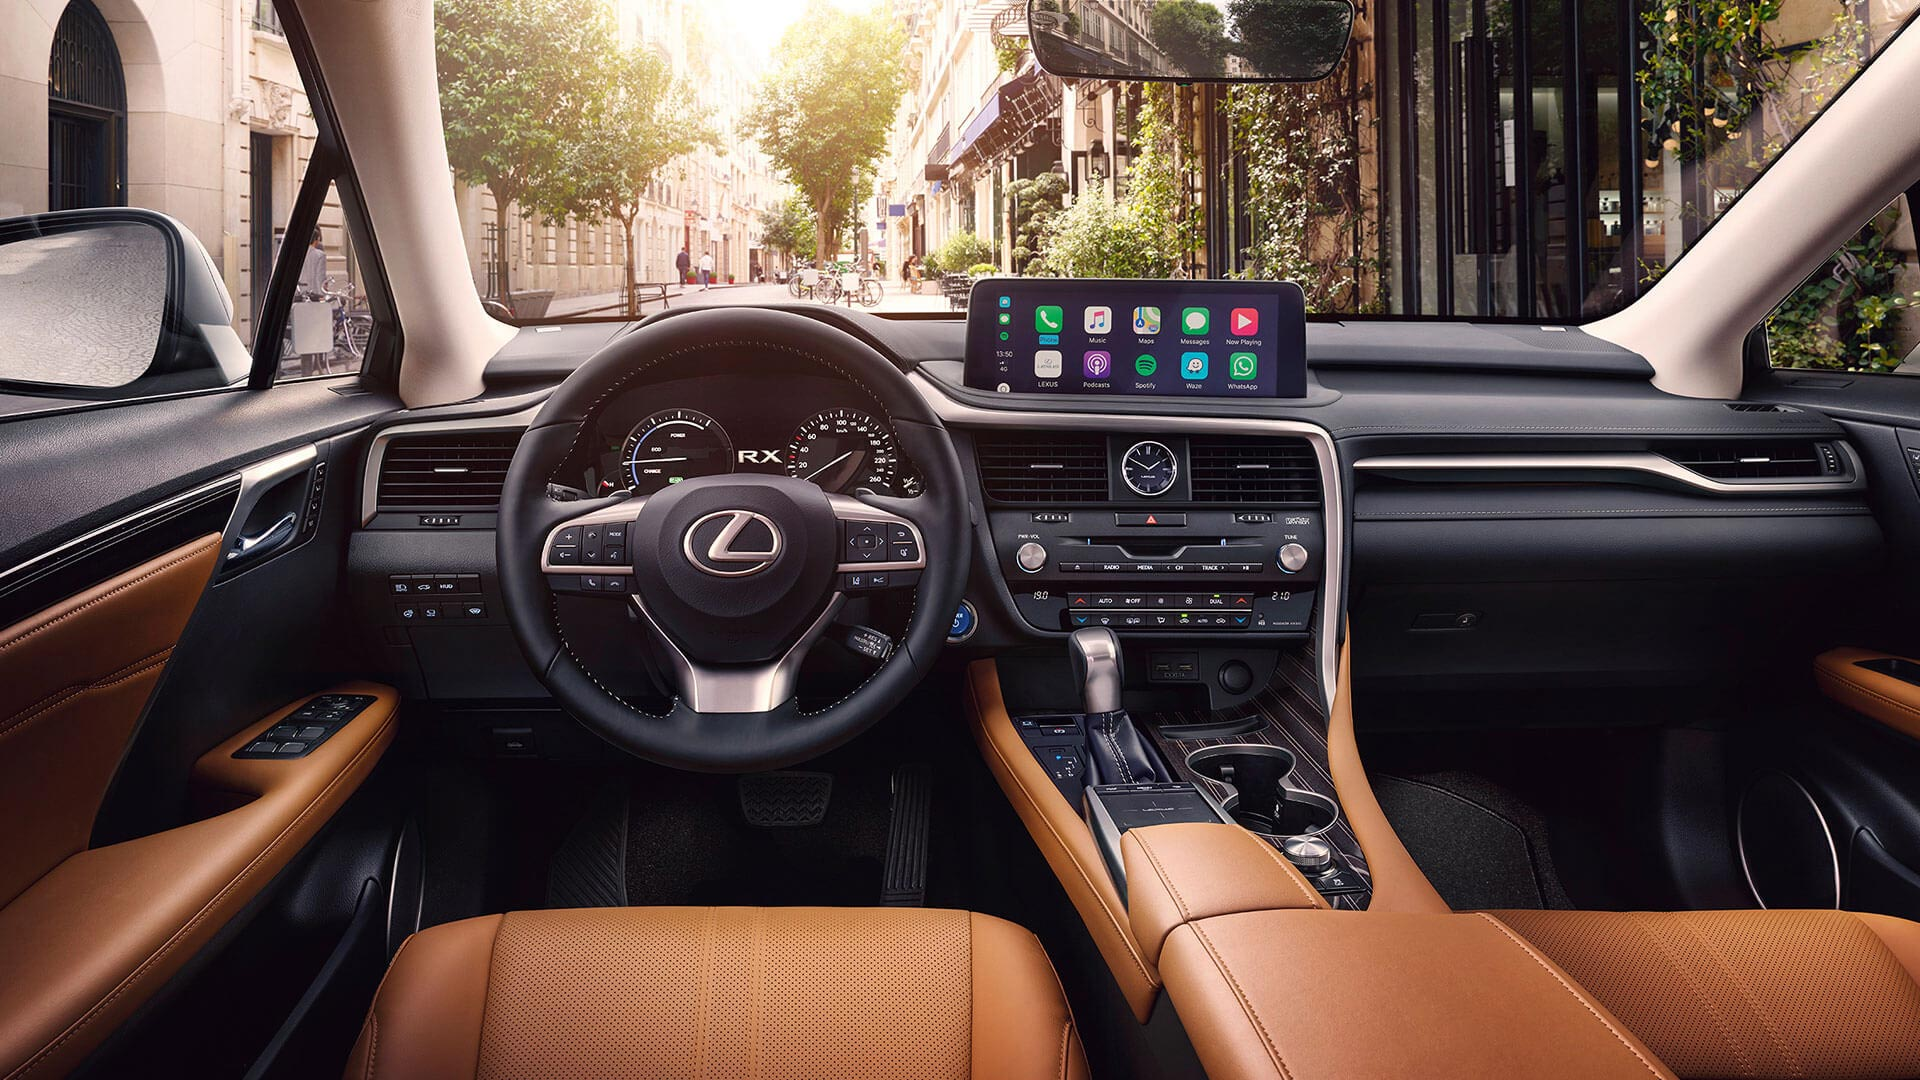 Lexus RX 450h Hybrid 2019 Cockpit